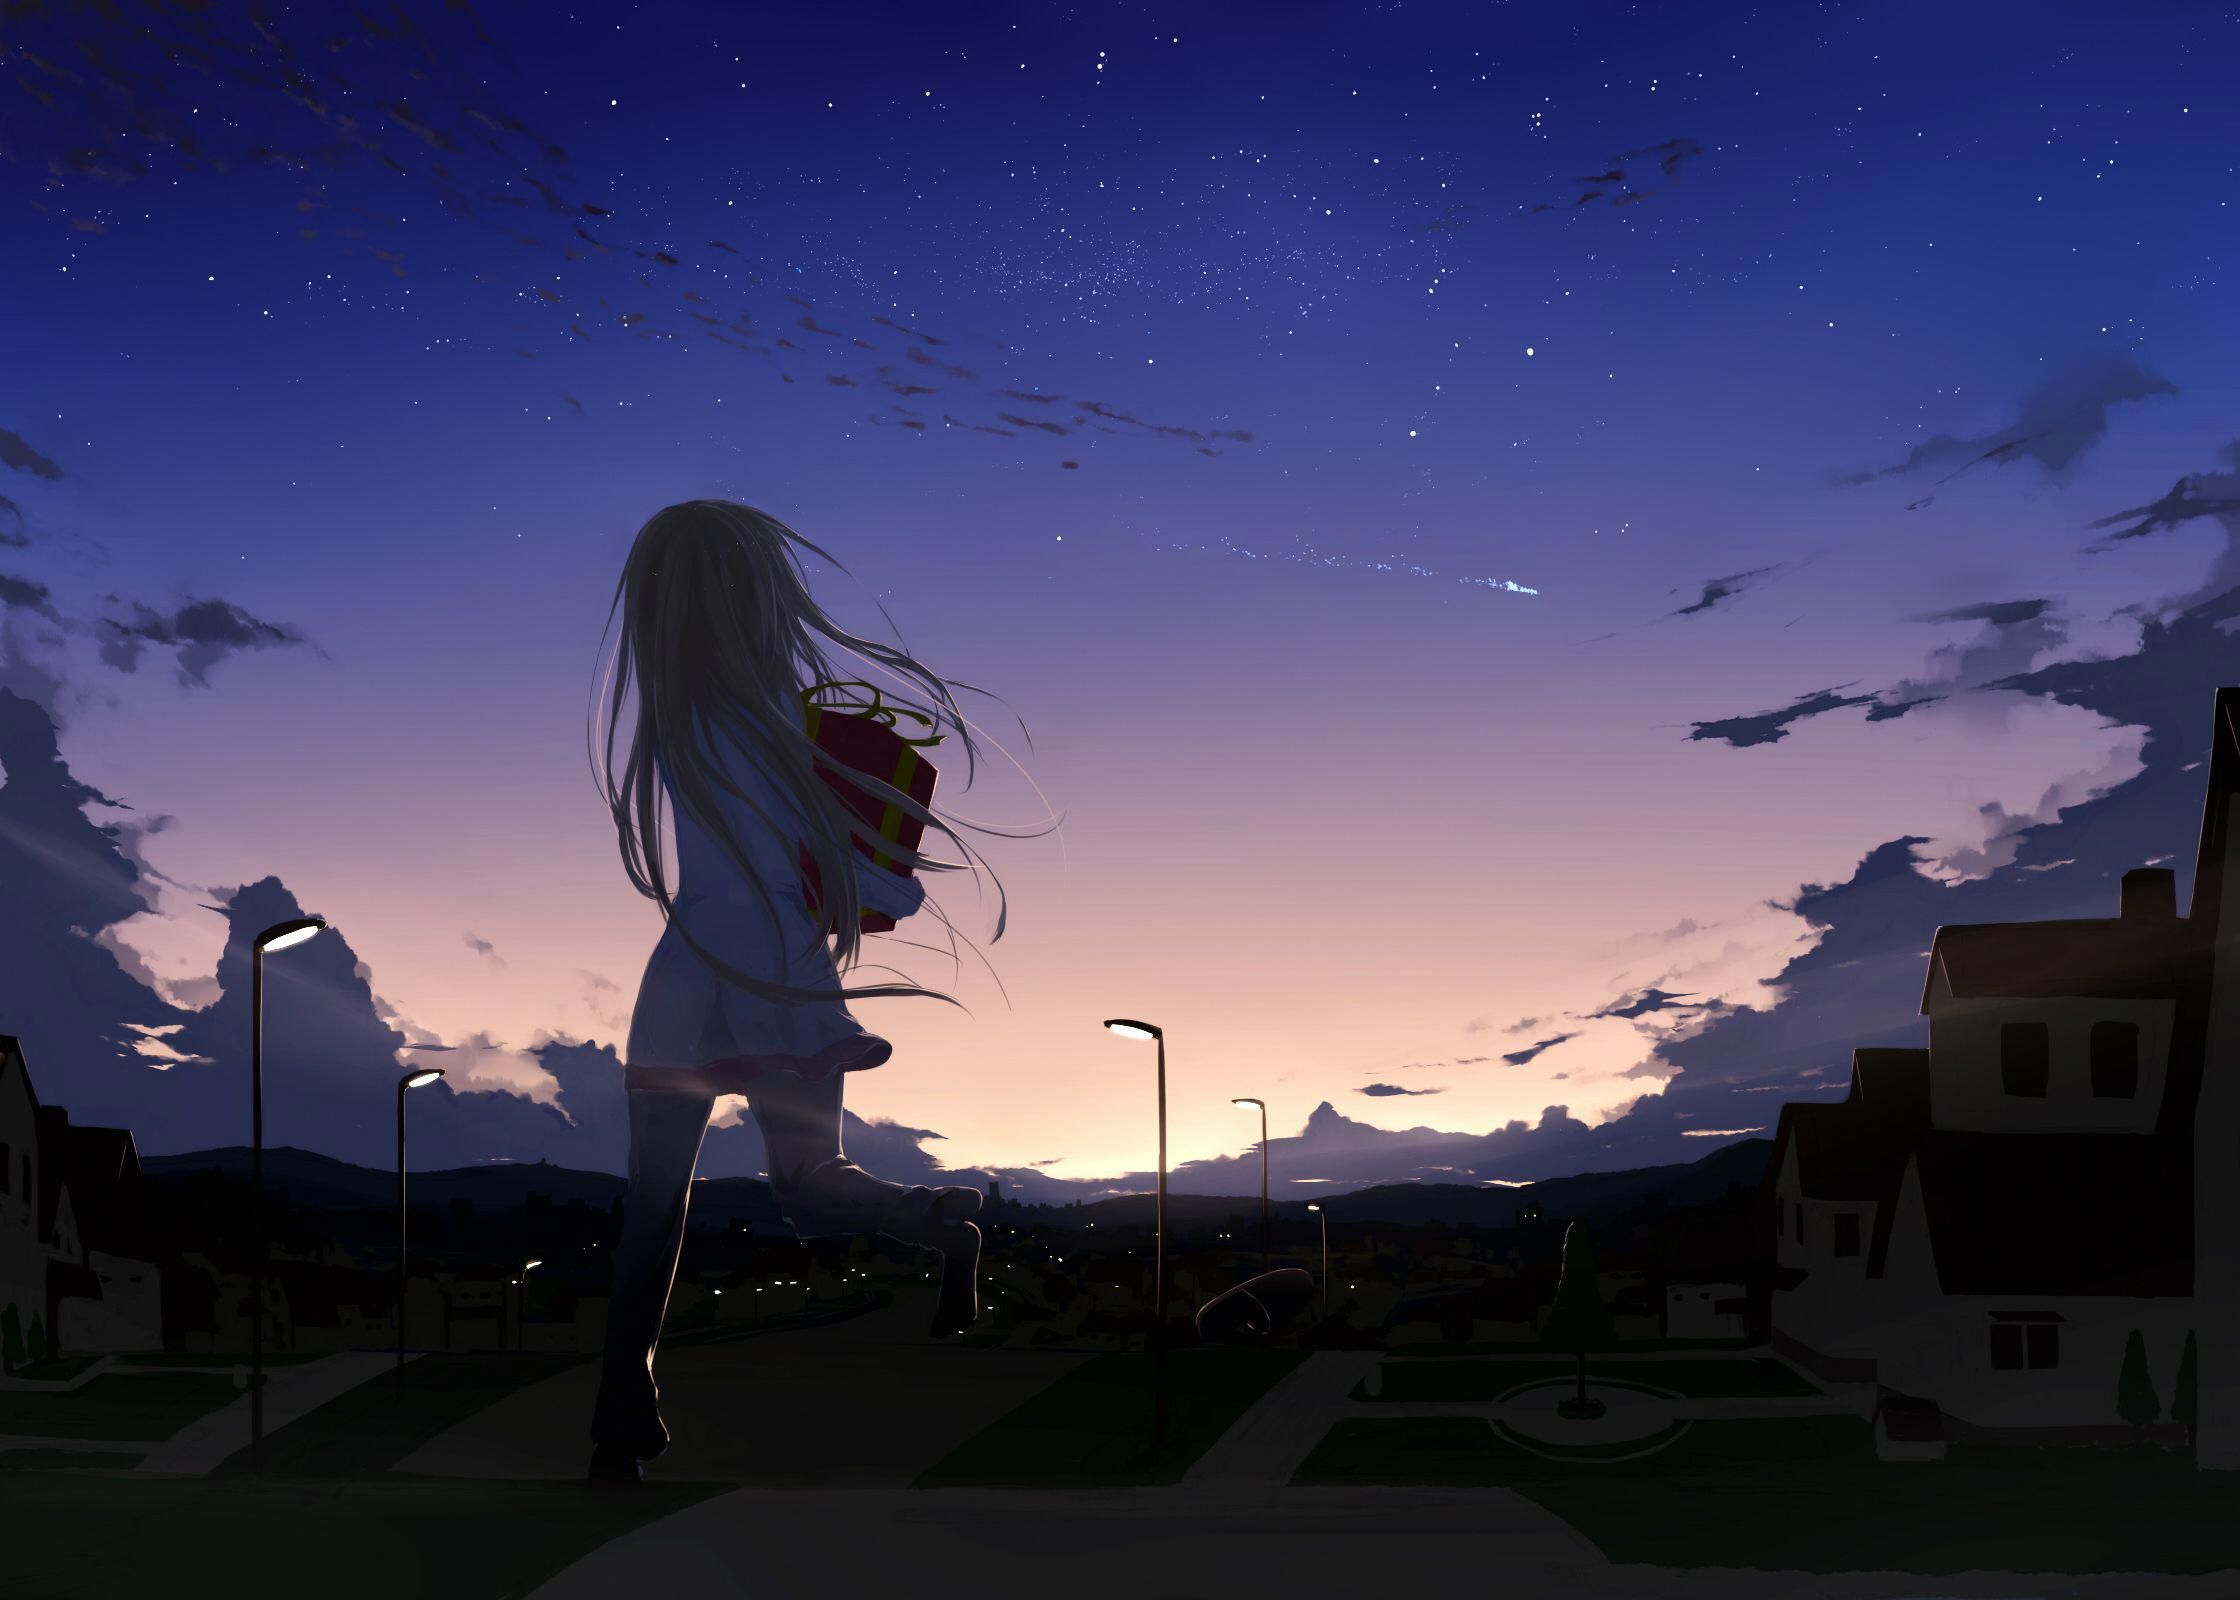 Loading Sky Anime Anime Scenery Anime Scenery Wallpaper Anime sky stars wallpaper